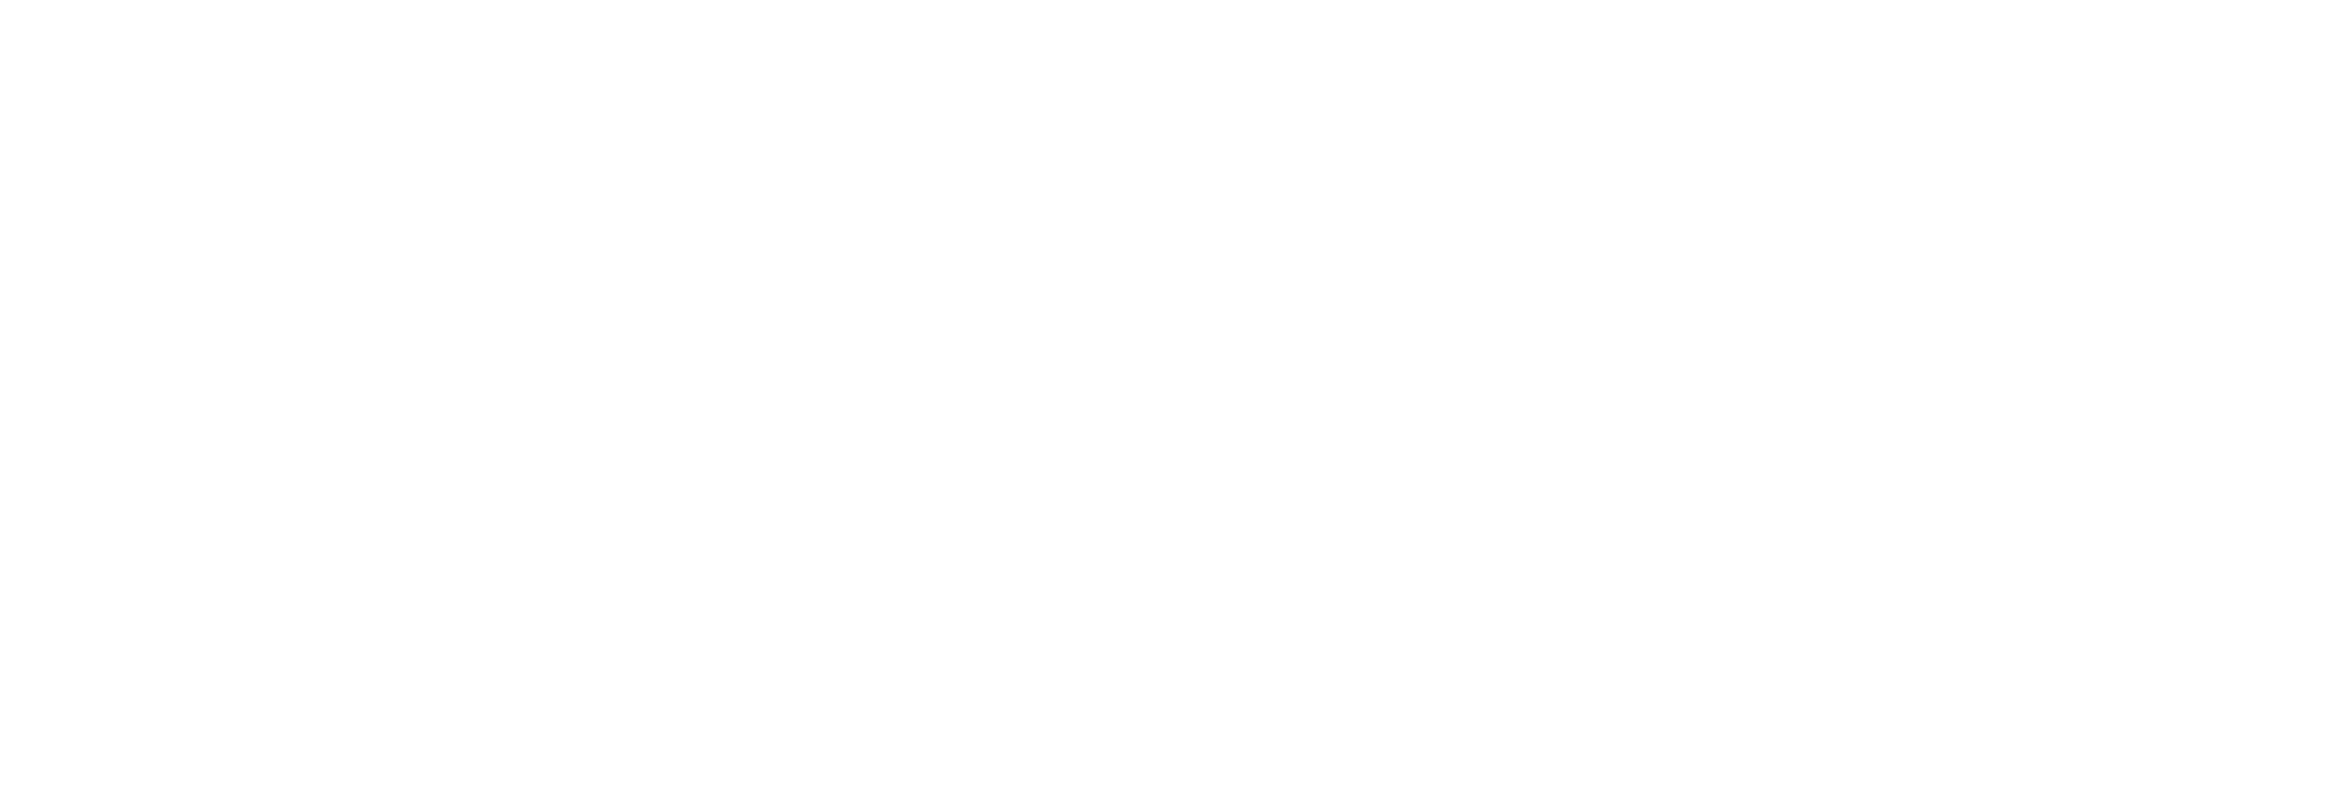 aquamotion-saison-hiver-2018